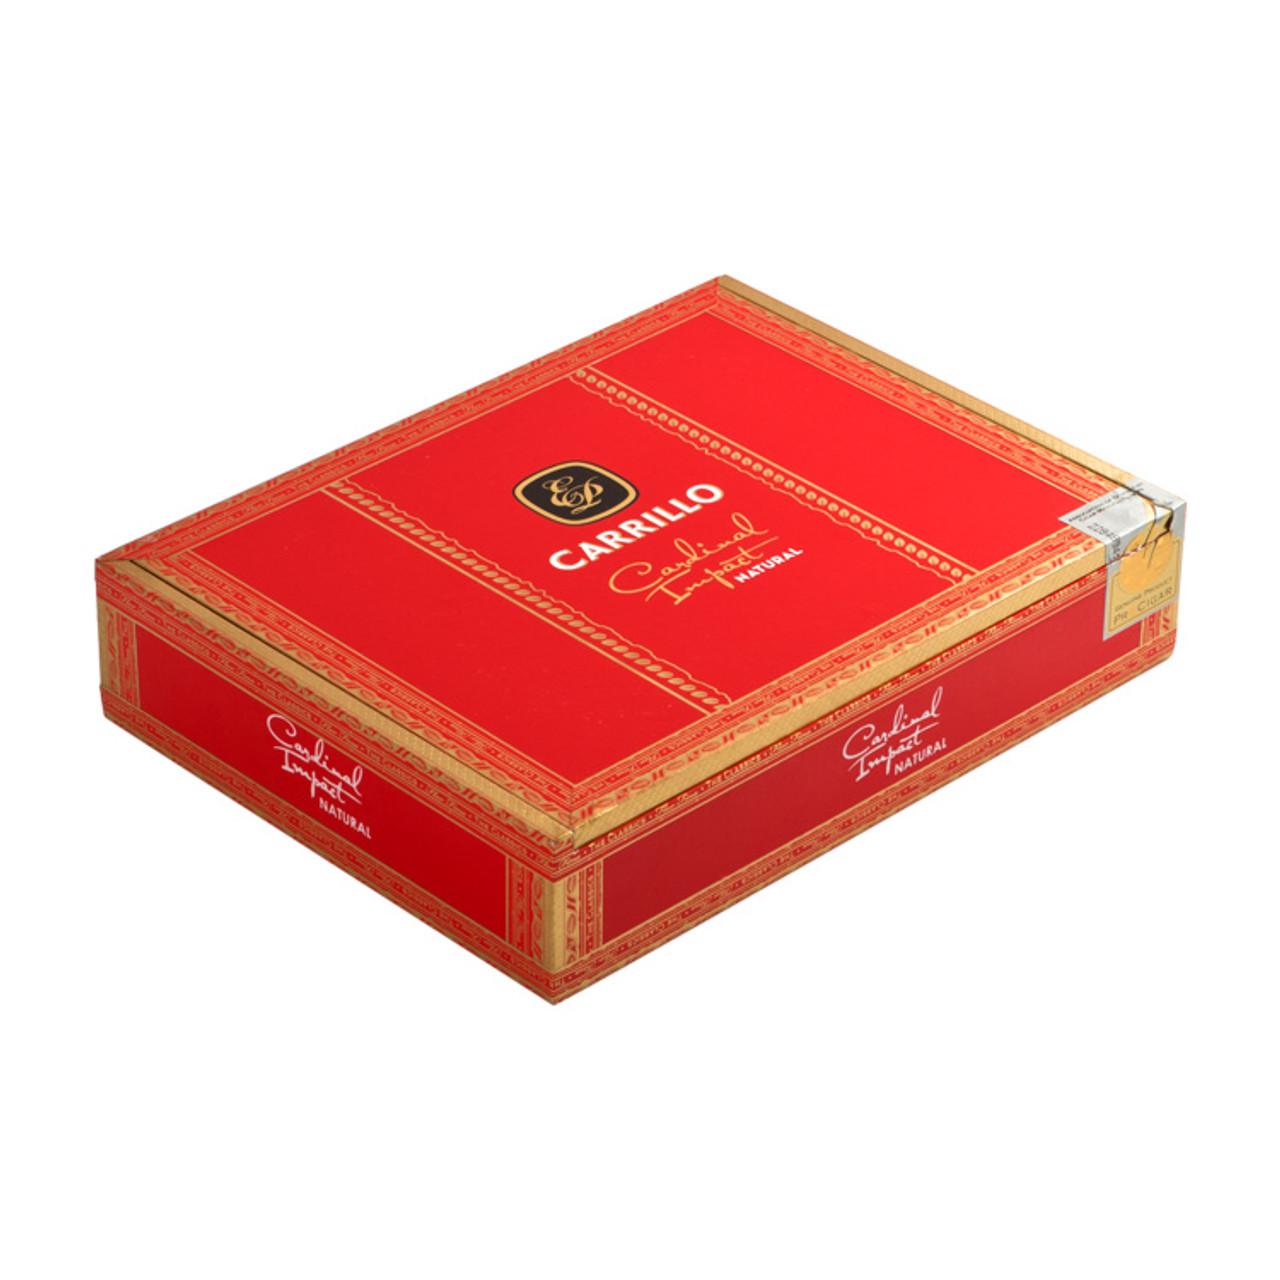 E.P. Carrillo Cardinal Impact No. 52 Cigars - 5 x 52 (Box of 20)